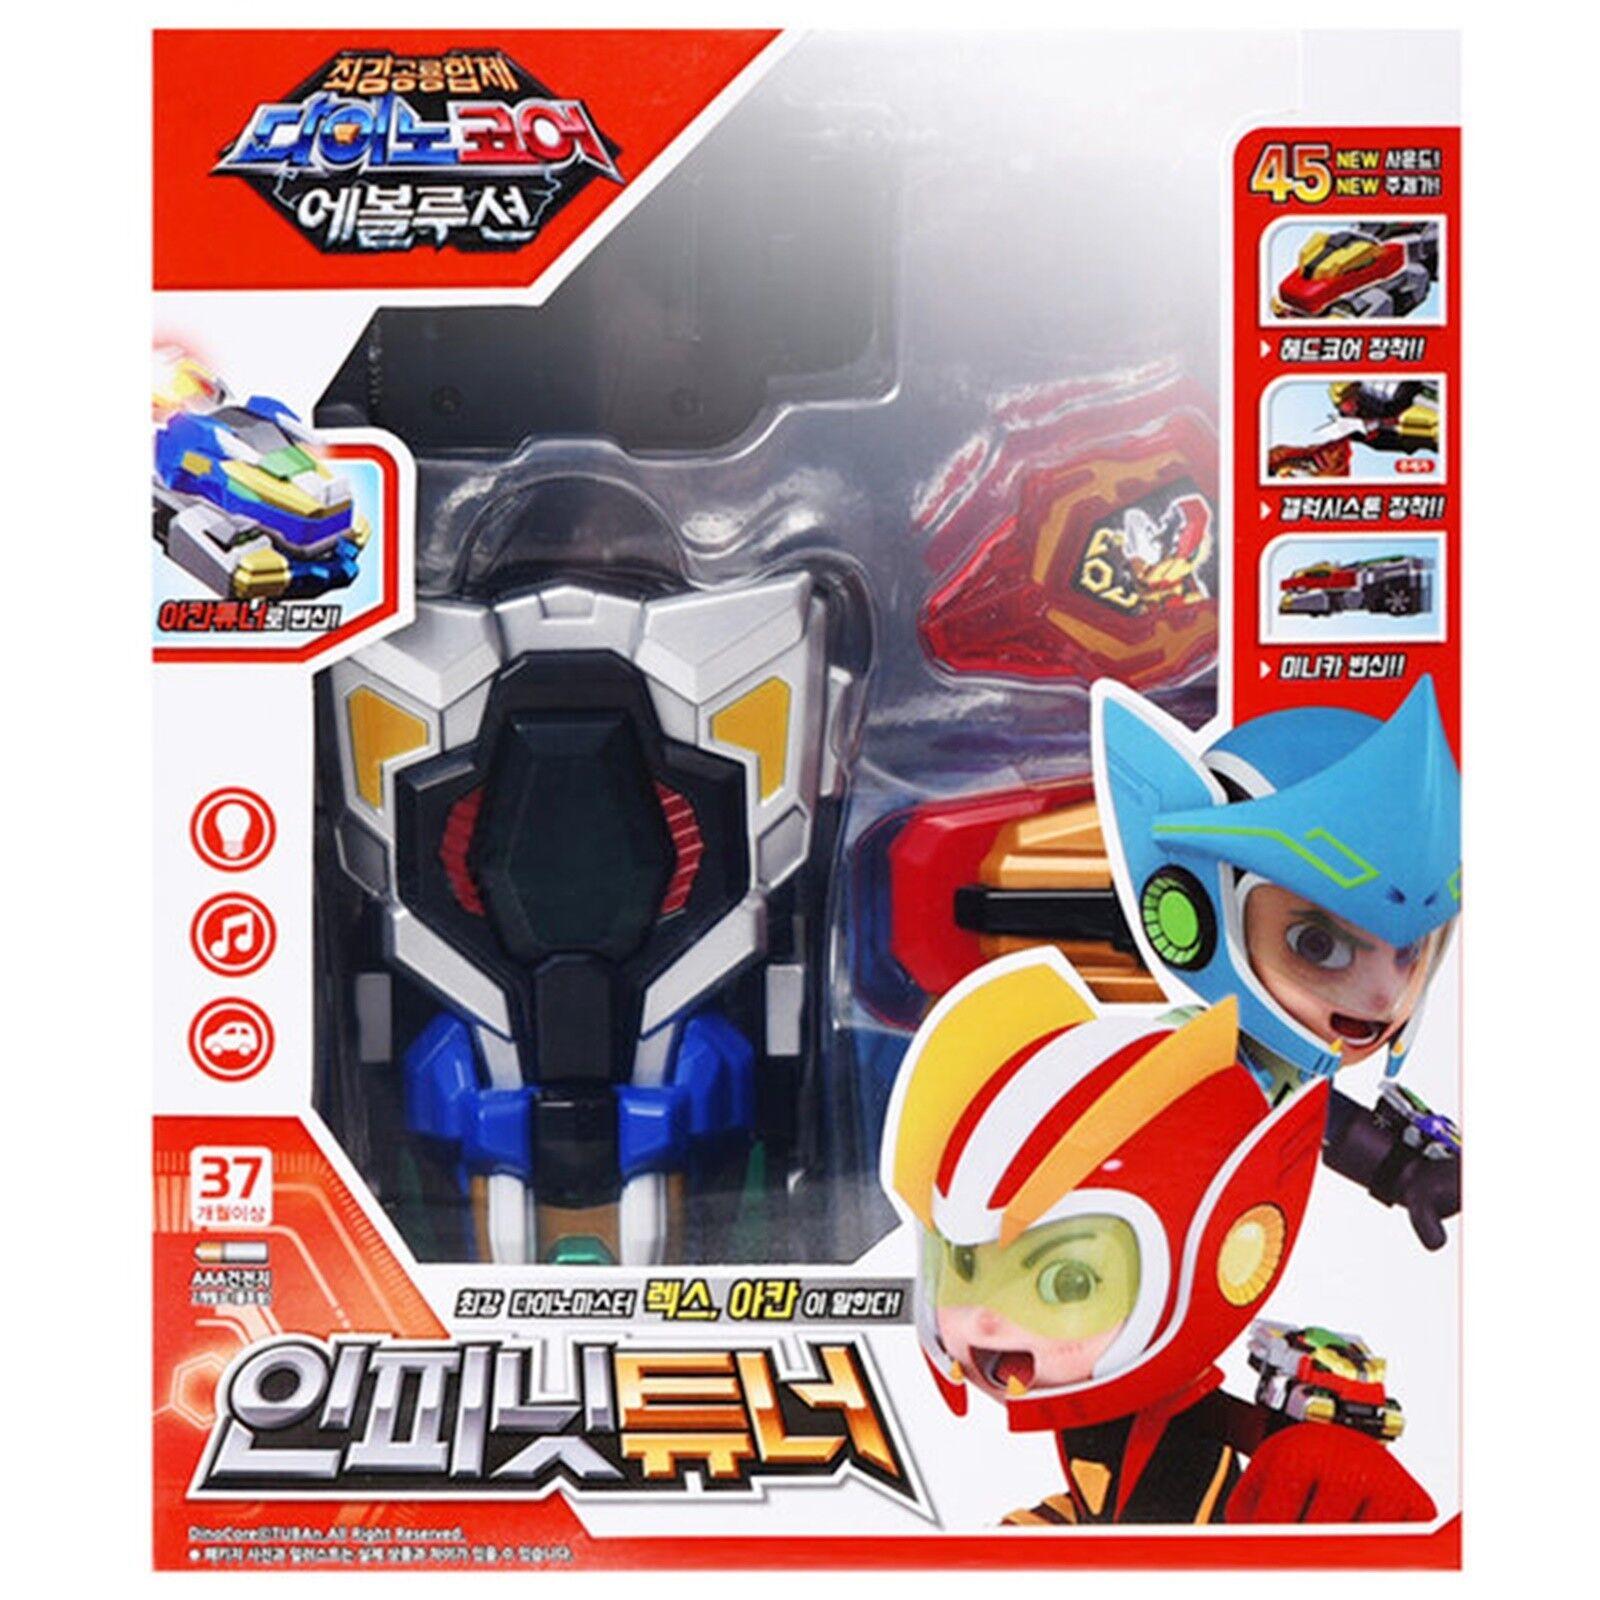 Dino Core Evolution Mega D-Fighter D-Fighter D-Fighter INFINITE TUNER Rex Acan Tuner Wrist Device 12df1f